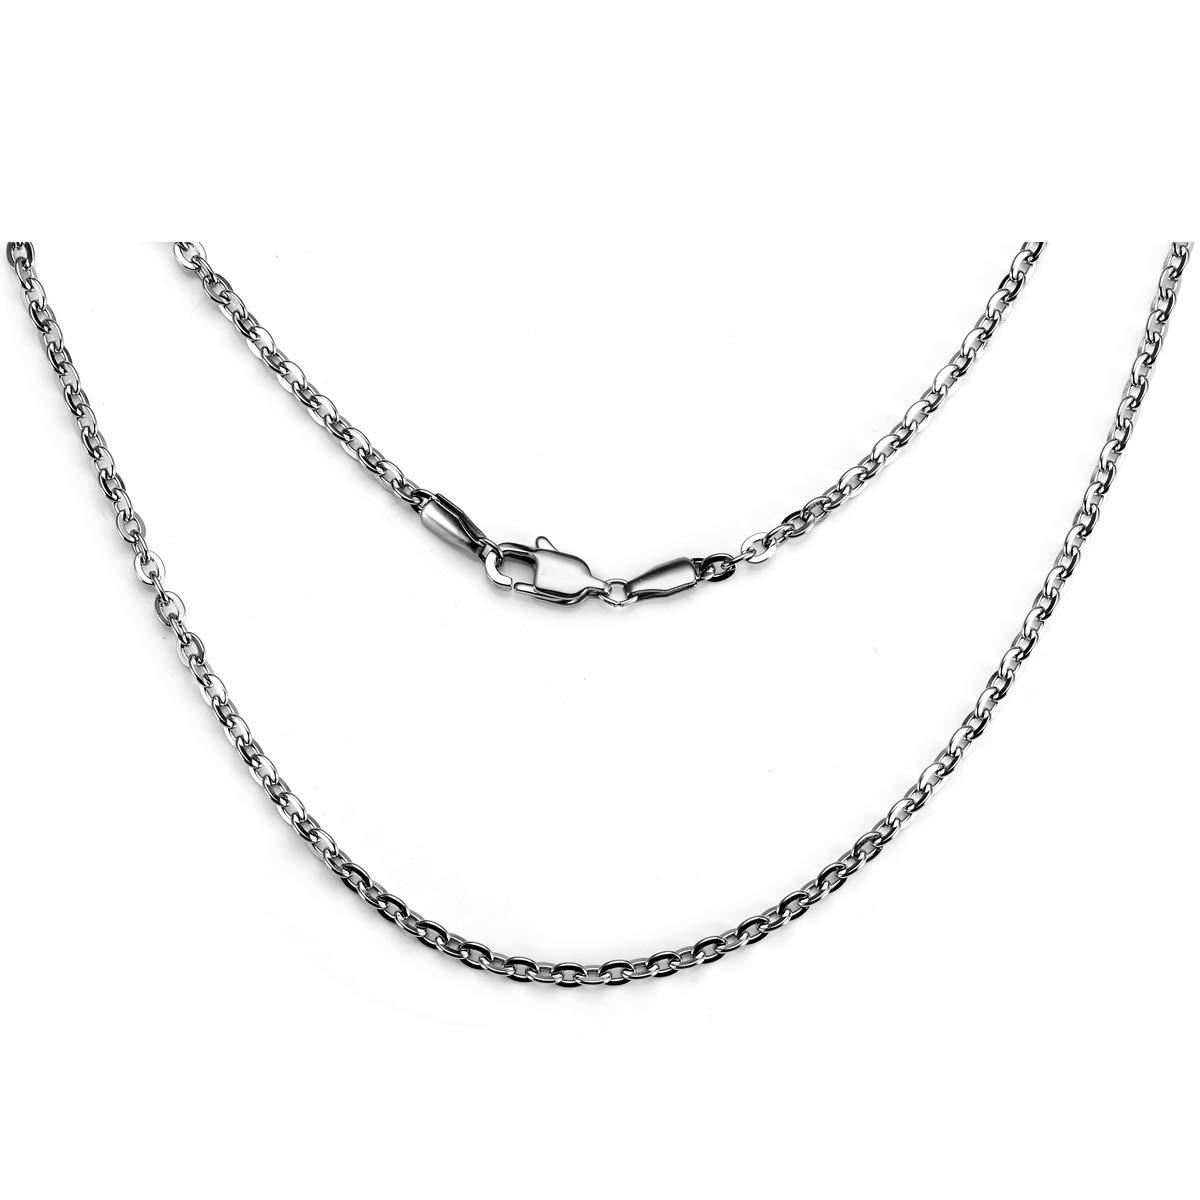 Amazon.com: Bacsn - Collar de cadena de plata para hombre de ...